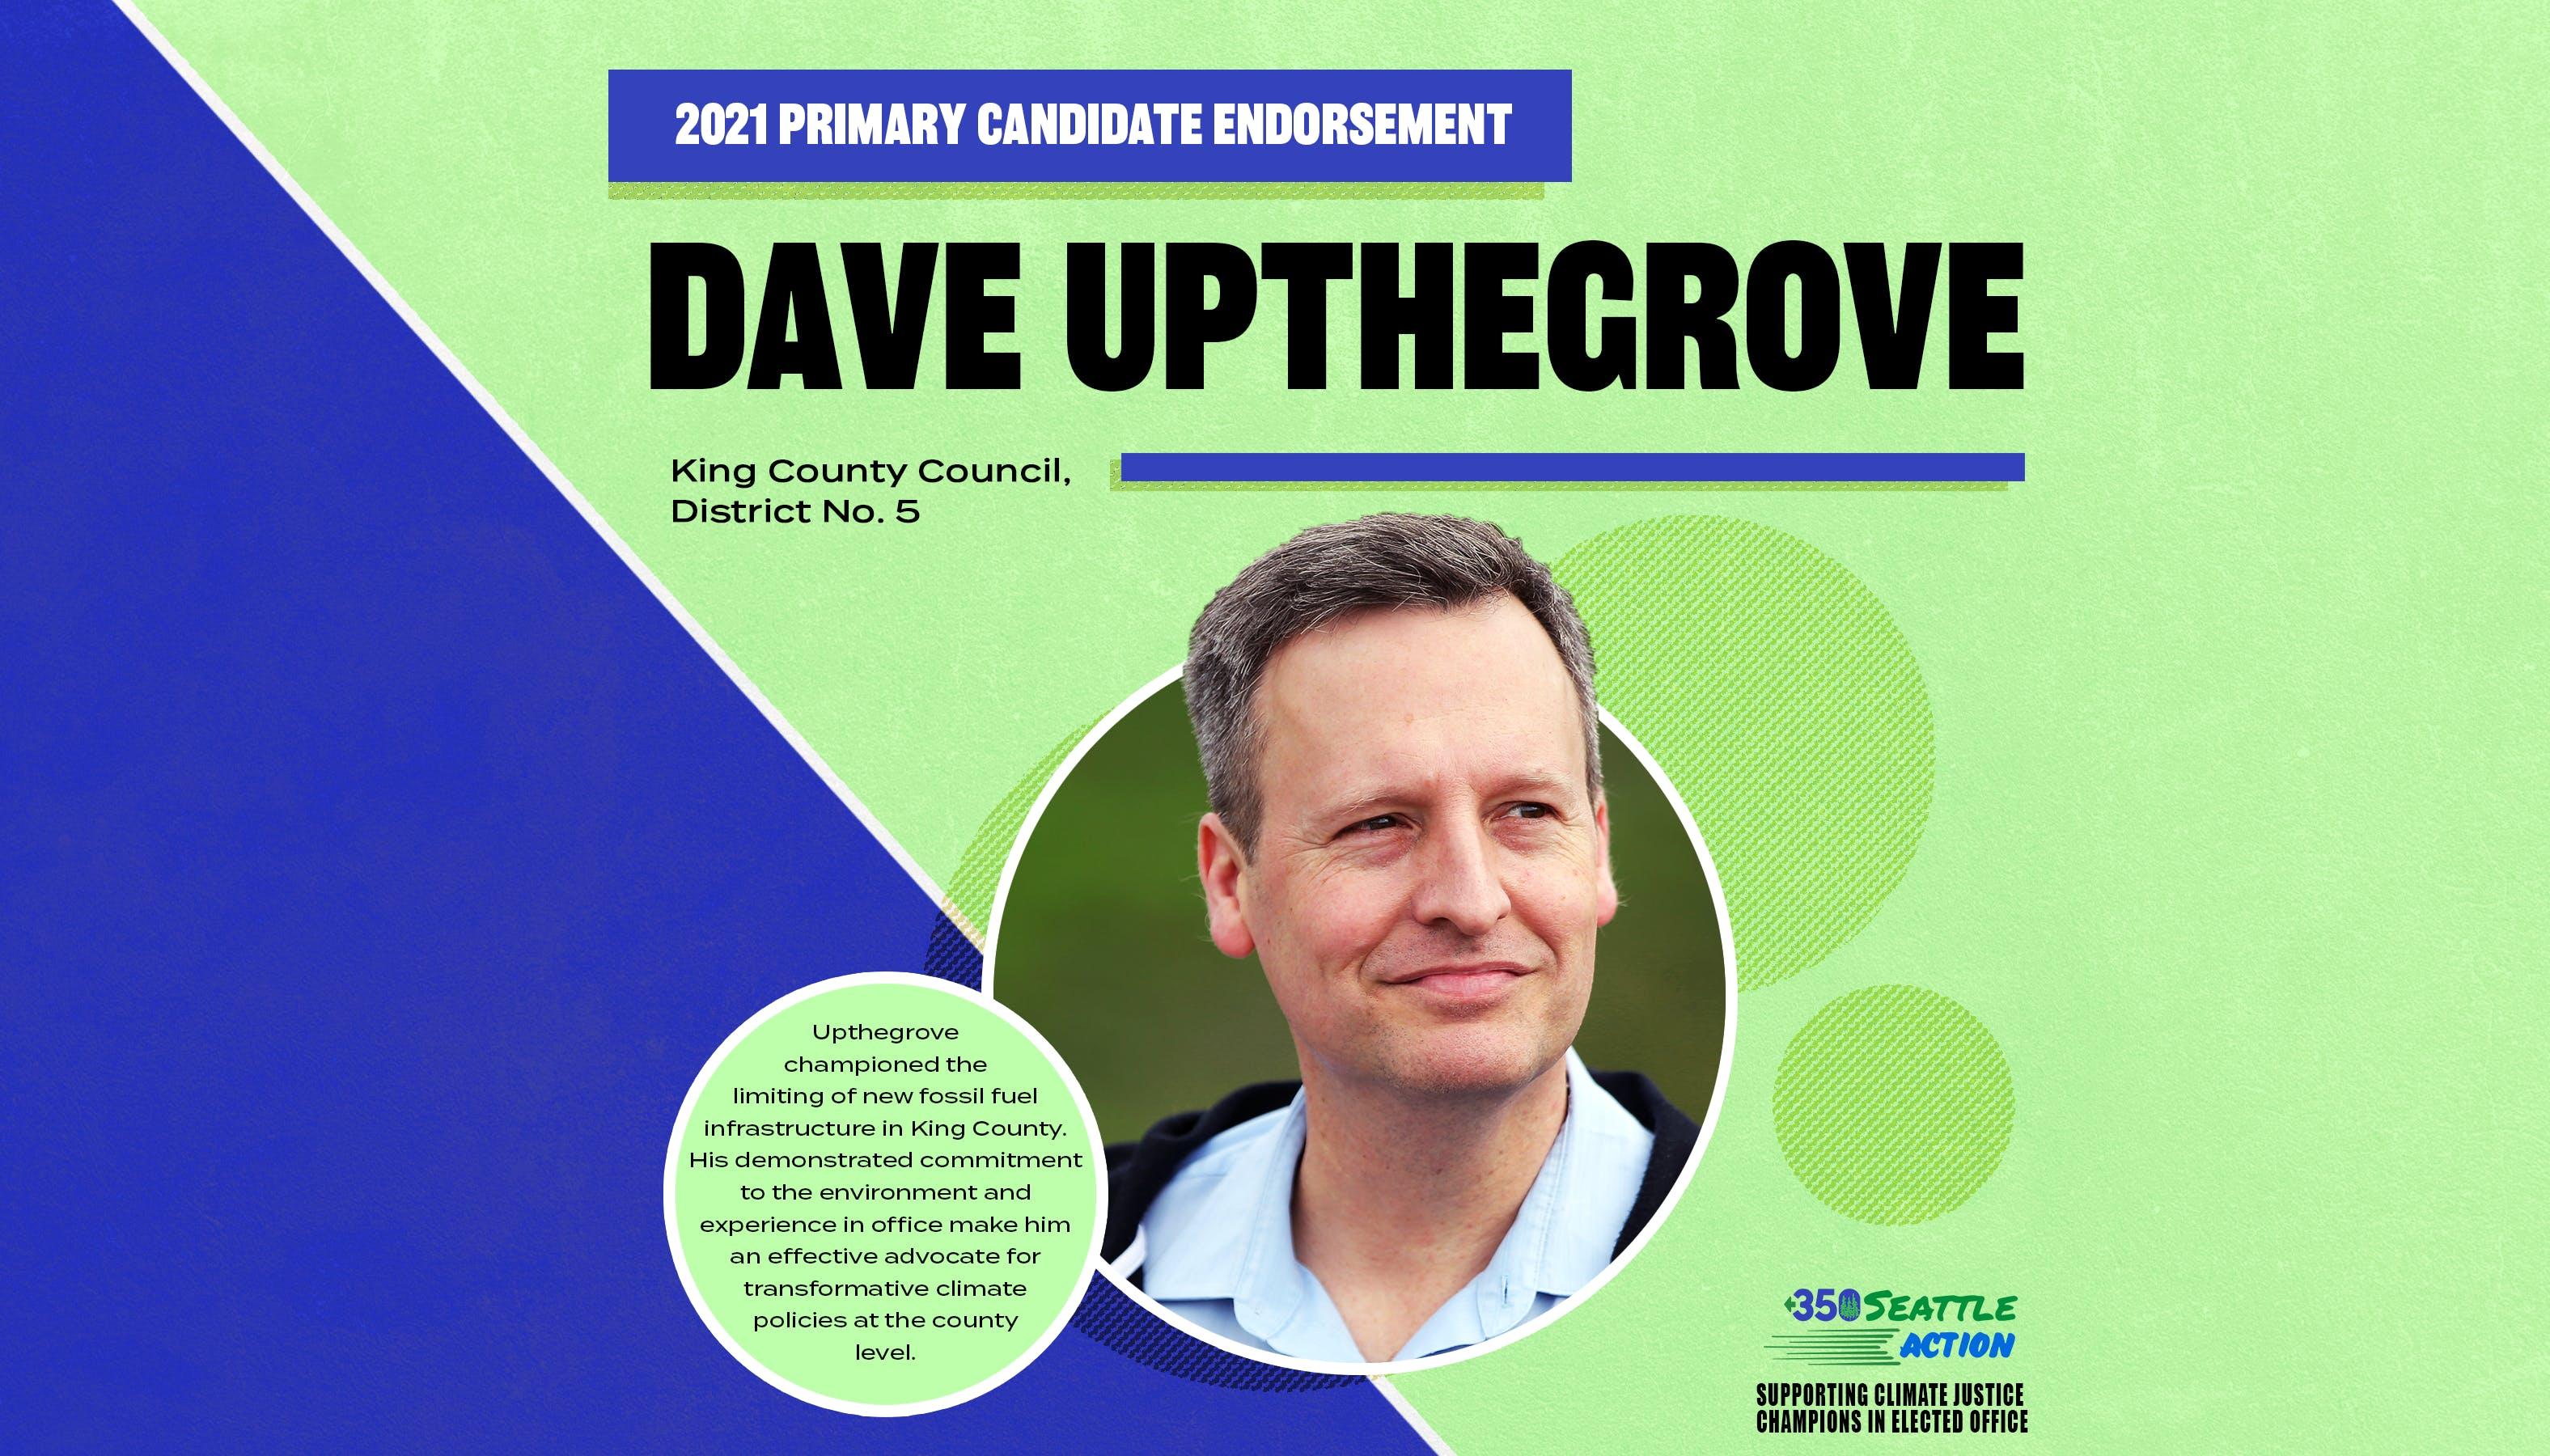 Dave Upthegrove Twitter.png